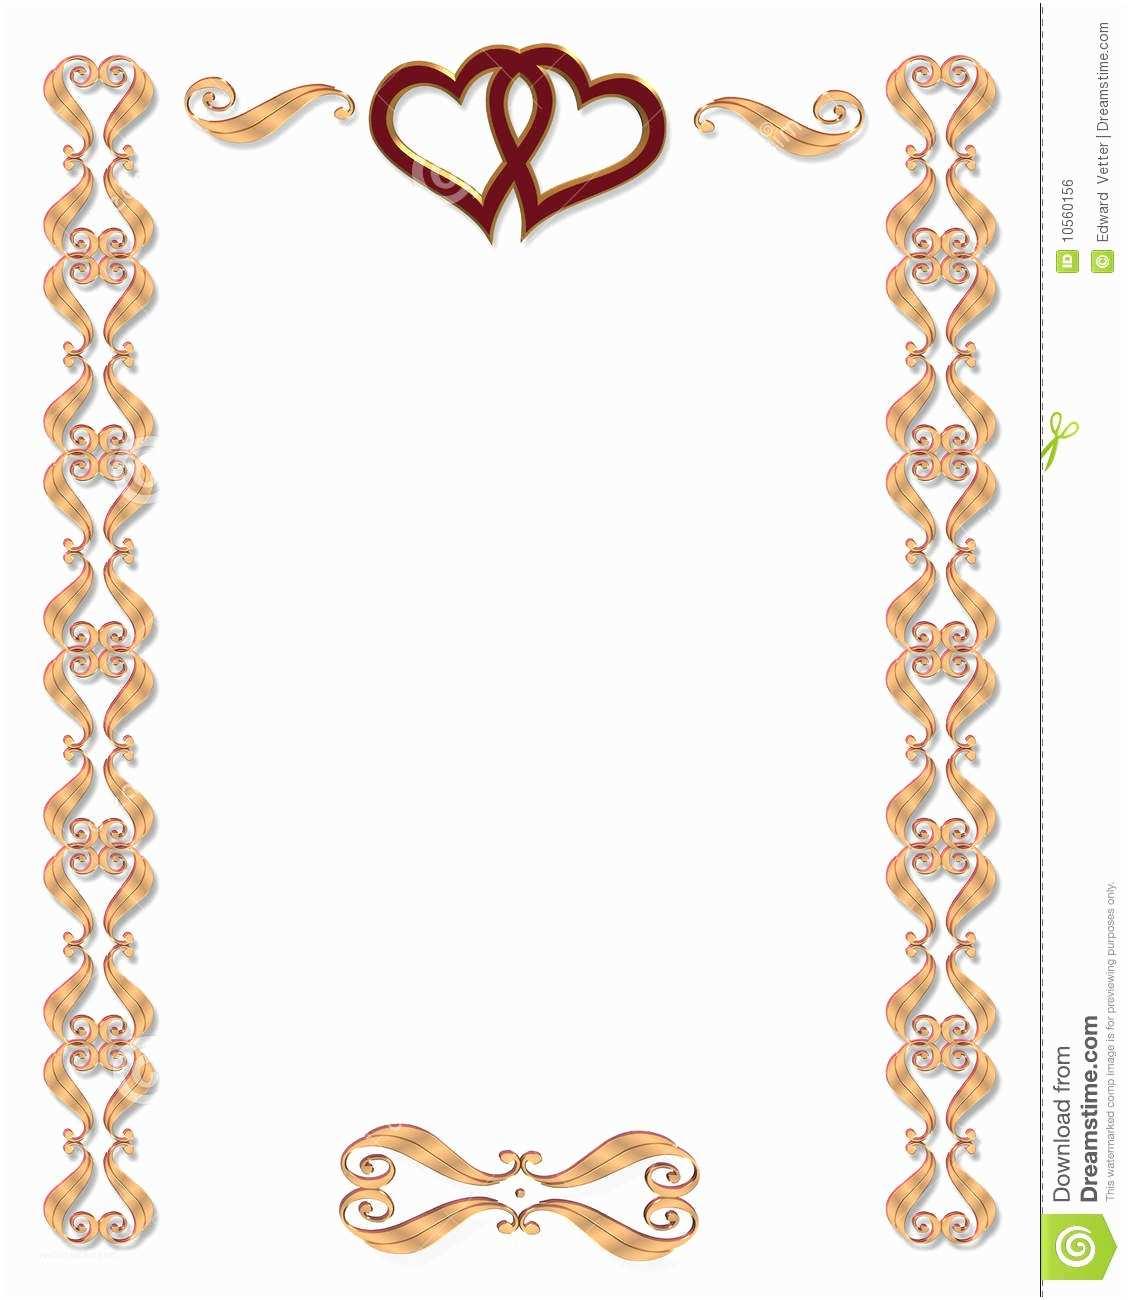 Wedding Invitation Picture Frame Wedding Invitation Borders Clip Art for Free – 101 Clip Art